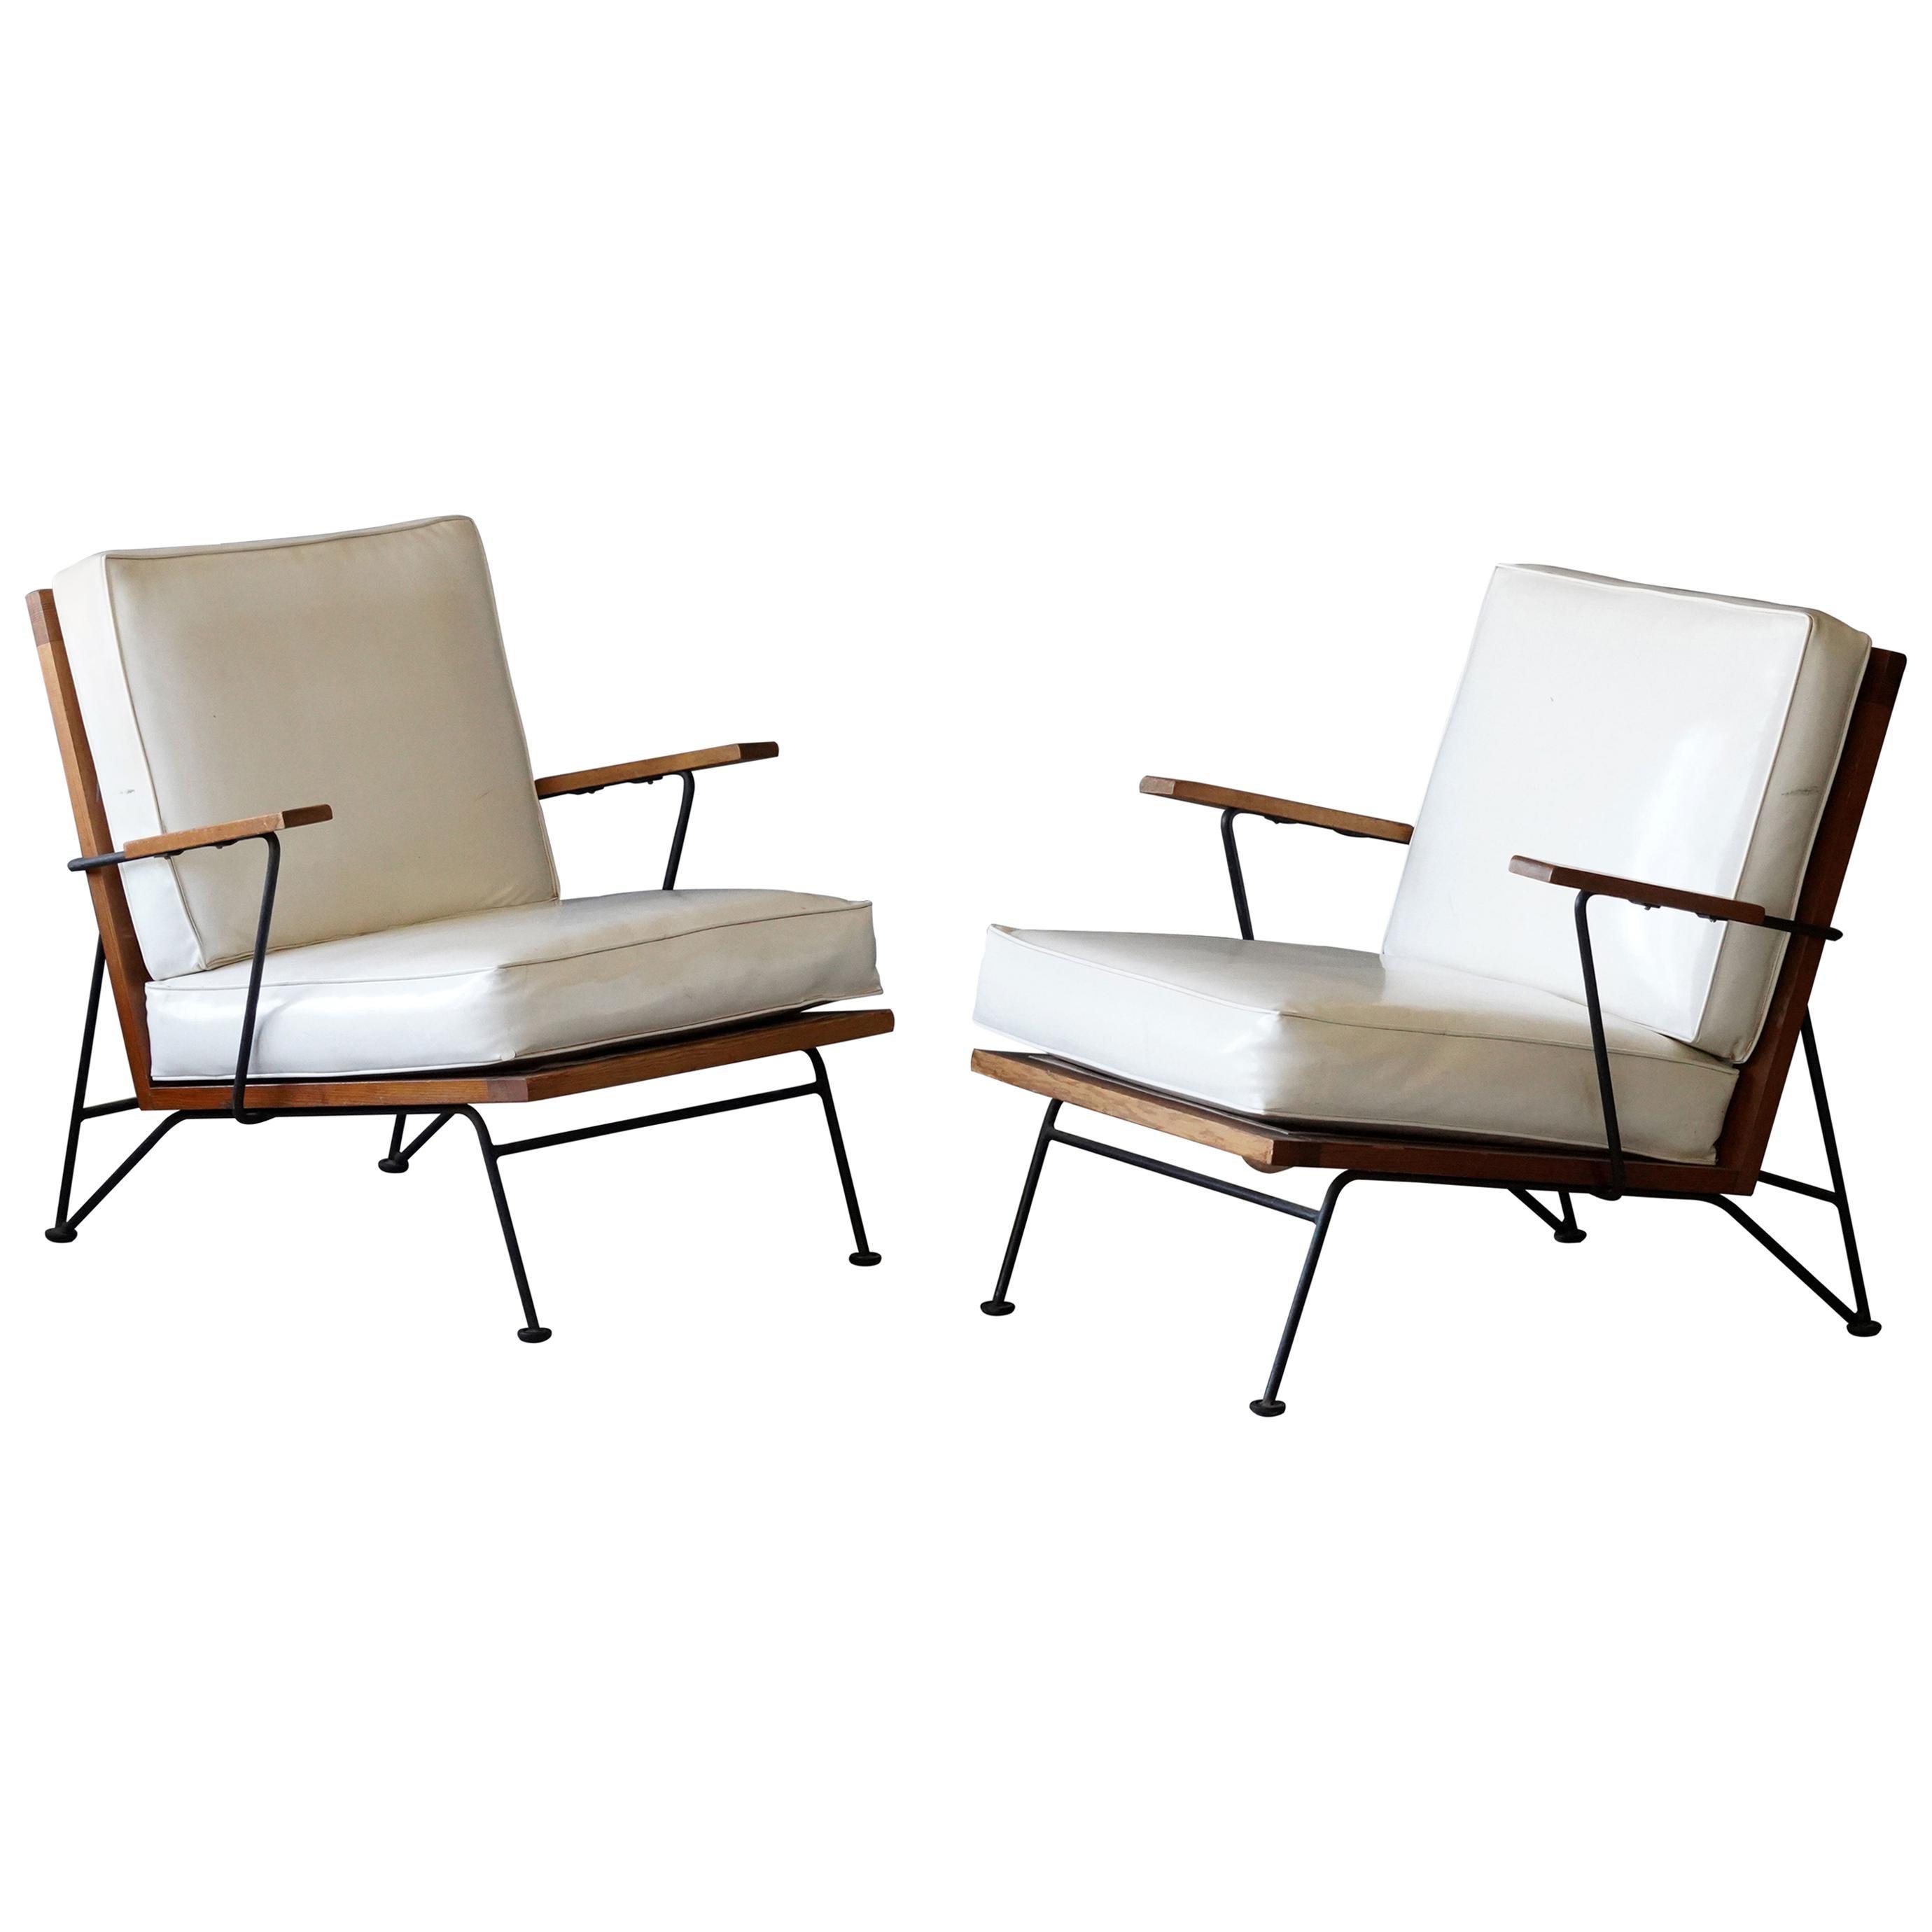 Pipsan Saarinen, Lounge Chairs, White Leather Rope, Steel, Pine Ficks Reed, 1949